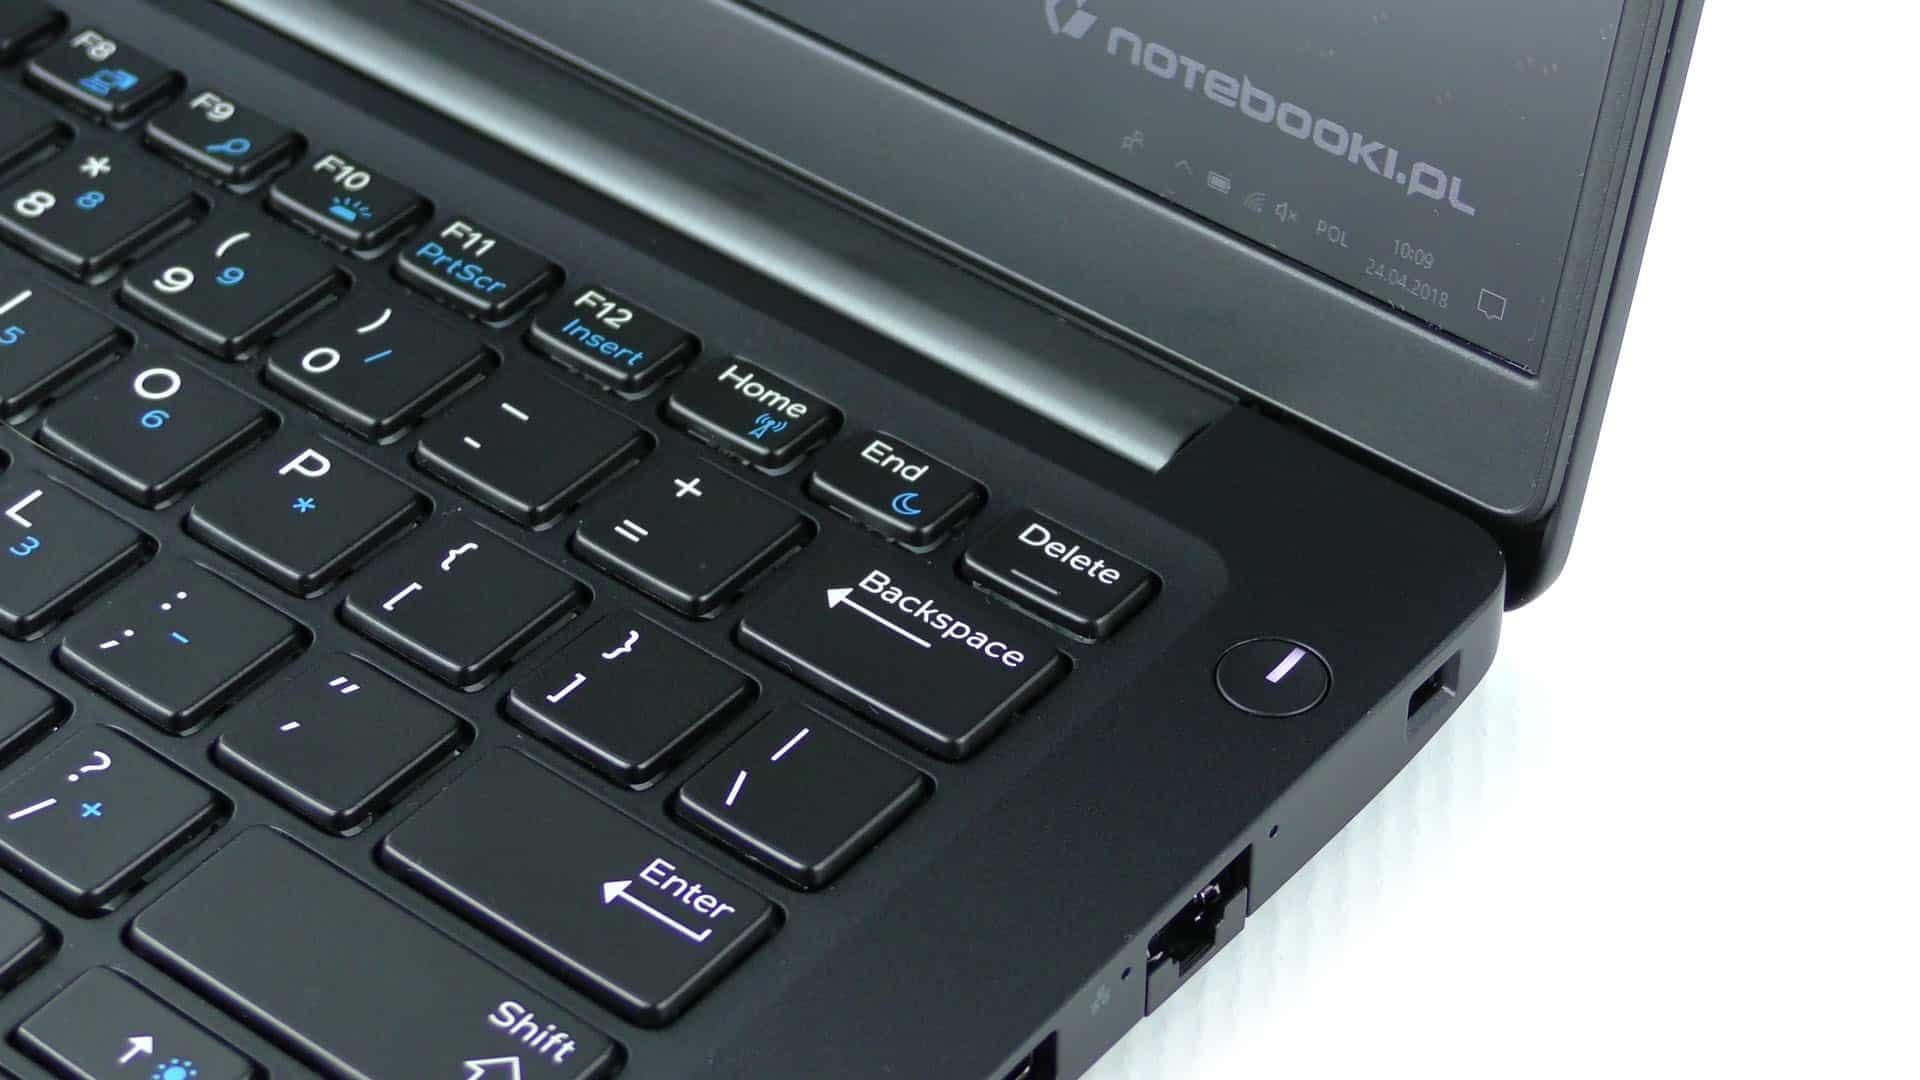 Dell Latitude 7390 - klawiatura i przycisk zasilania